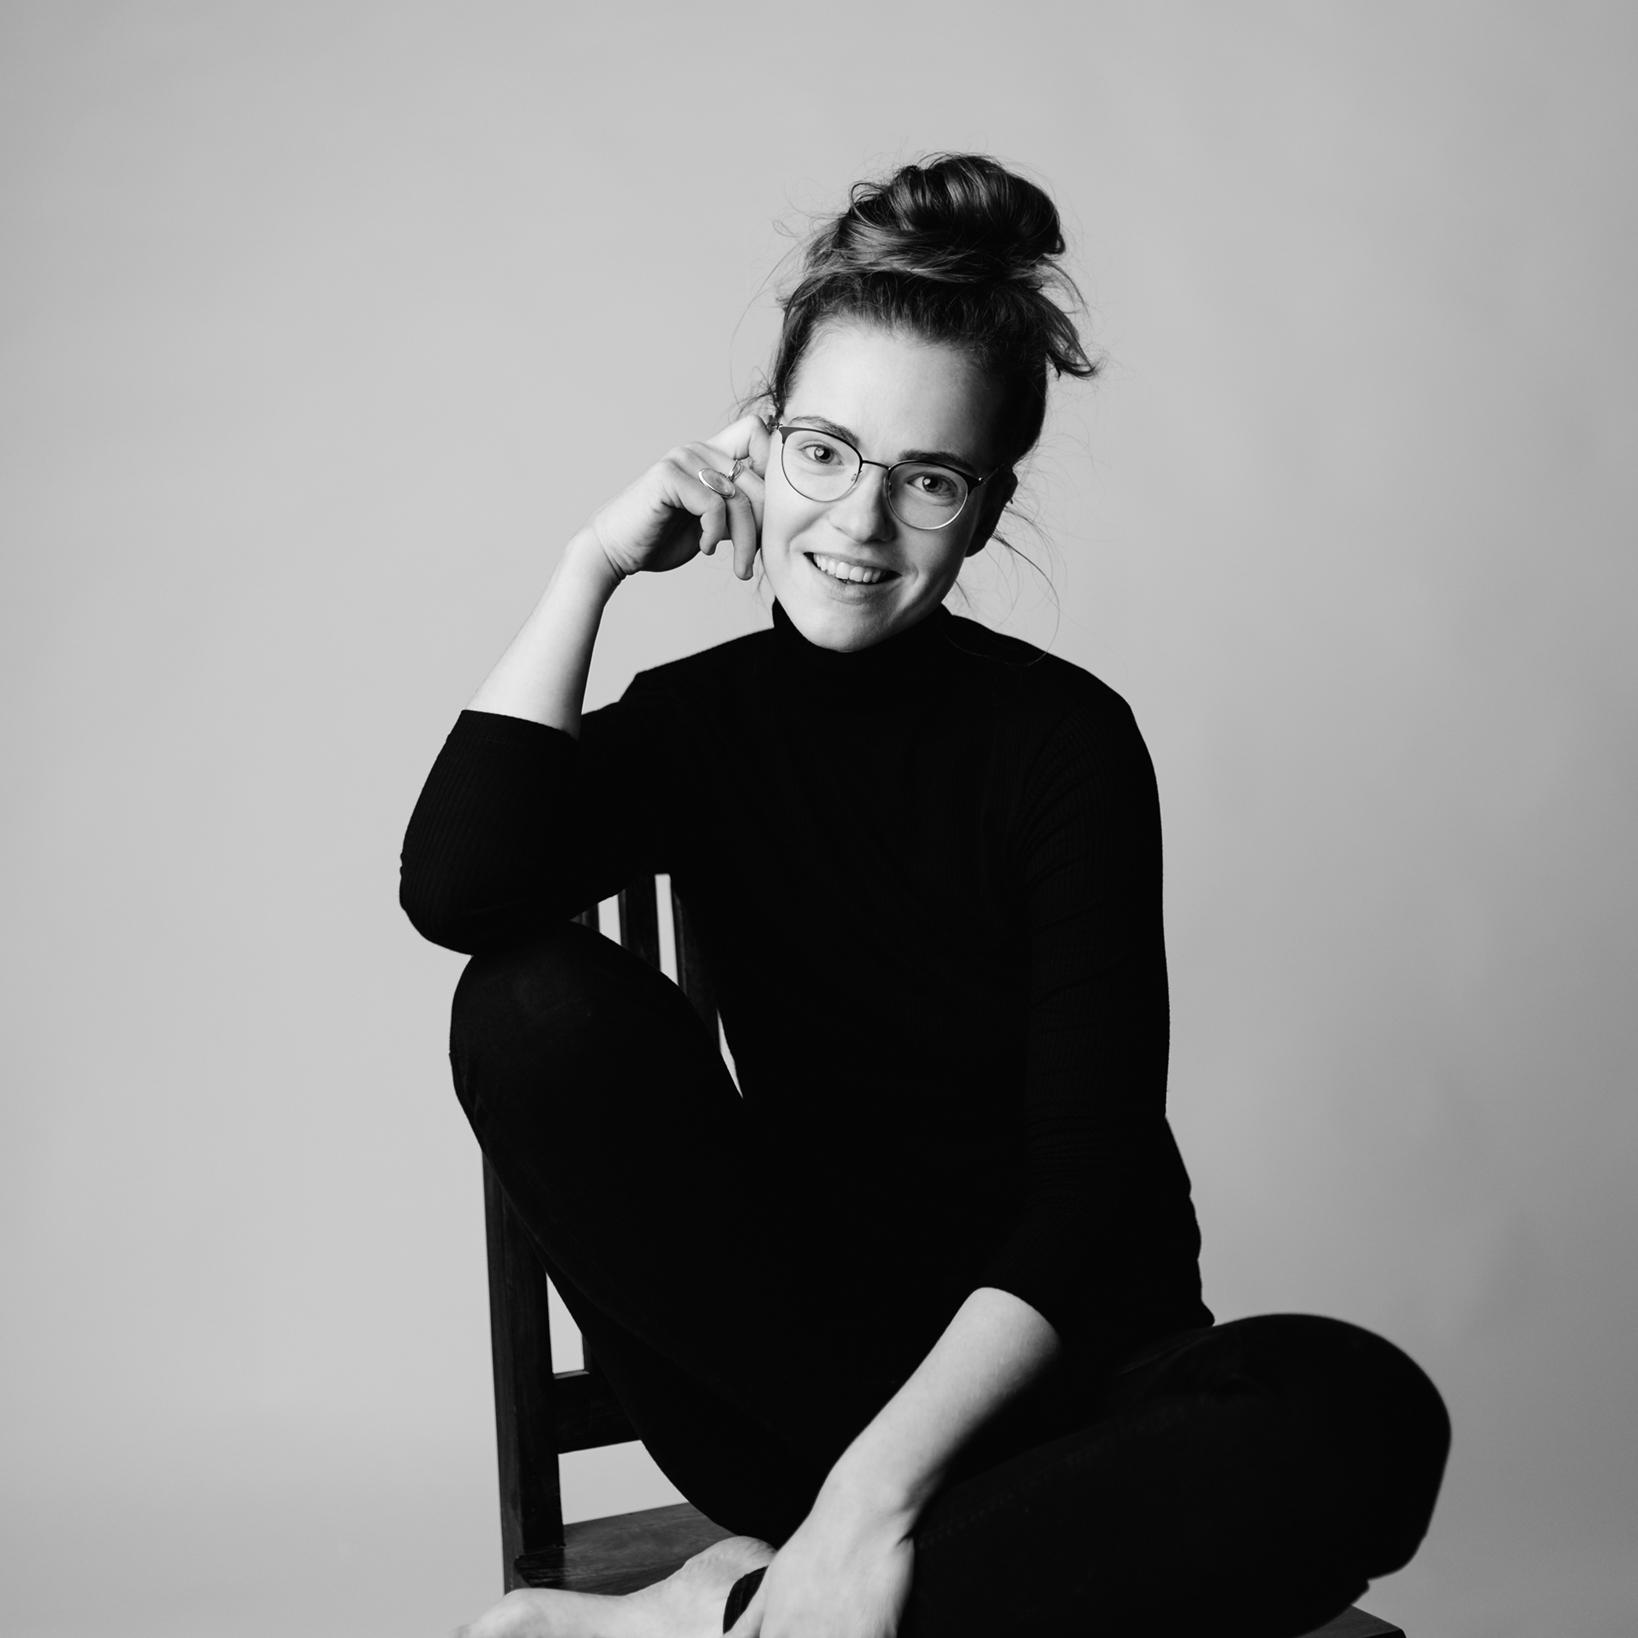 Elena M. E. Kiesel